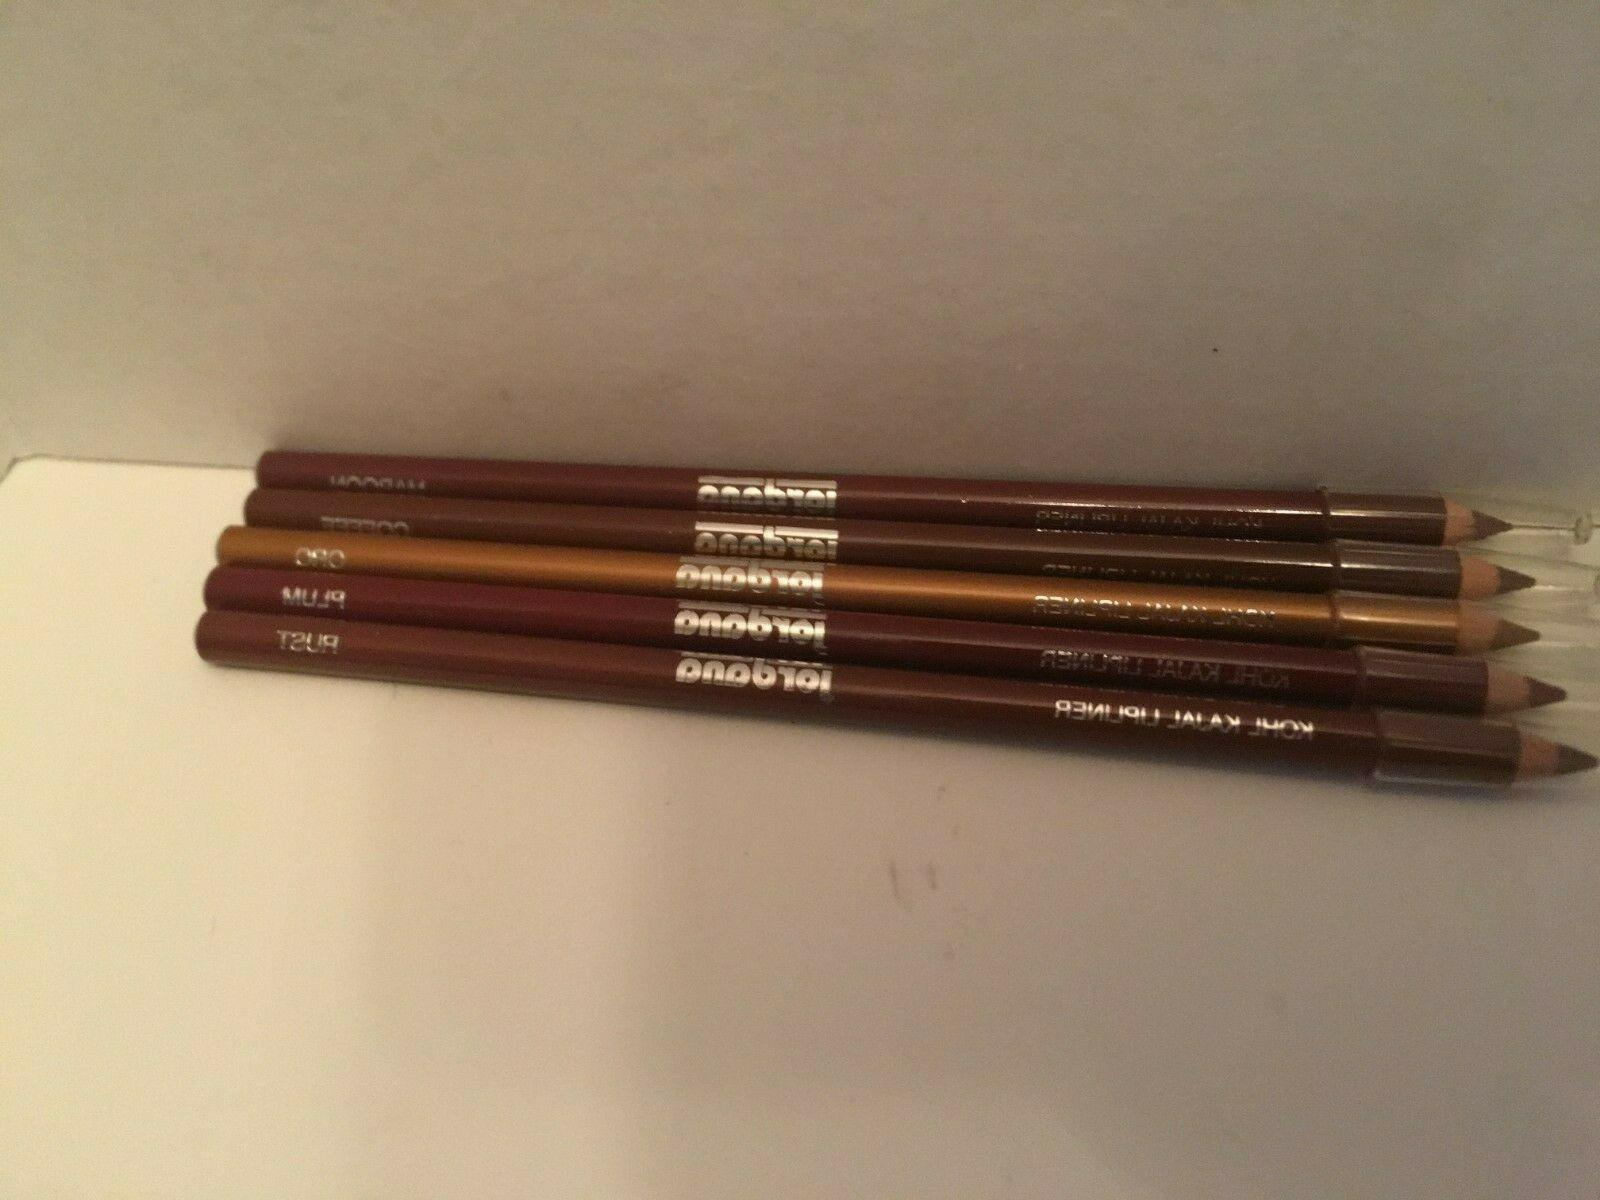 kohl lip liner gold plum rust maroon